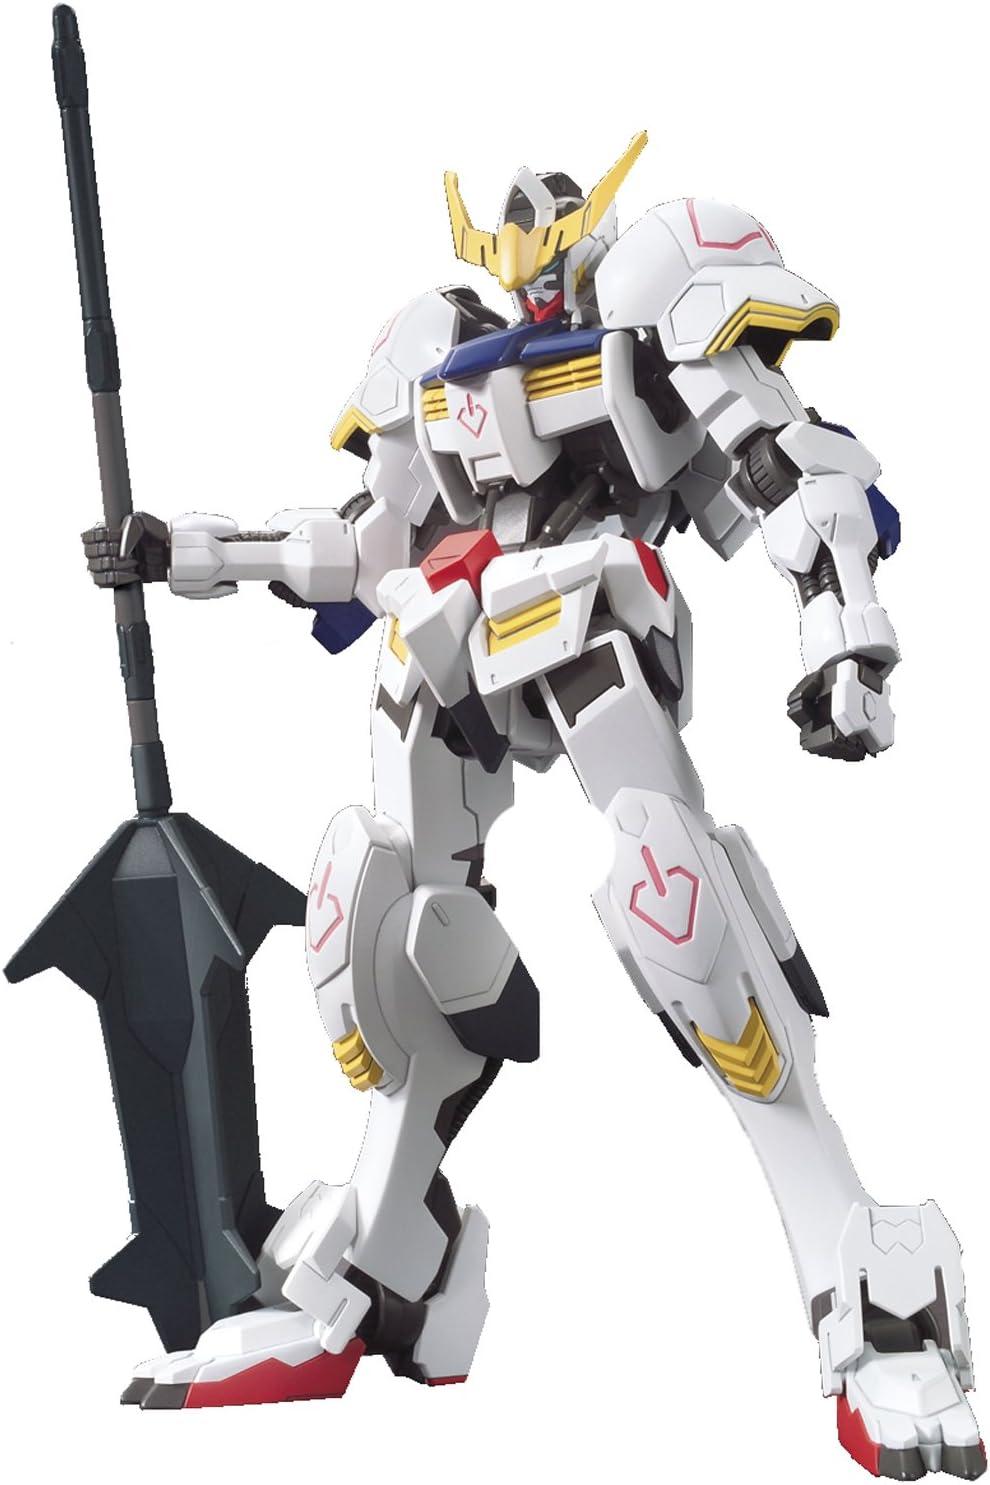 Bandai Hobby HG Orphans Gundam Barbatos Gundam Iron-Blooded Orphans Action Figure (BAN201873)